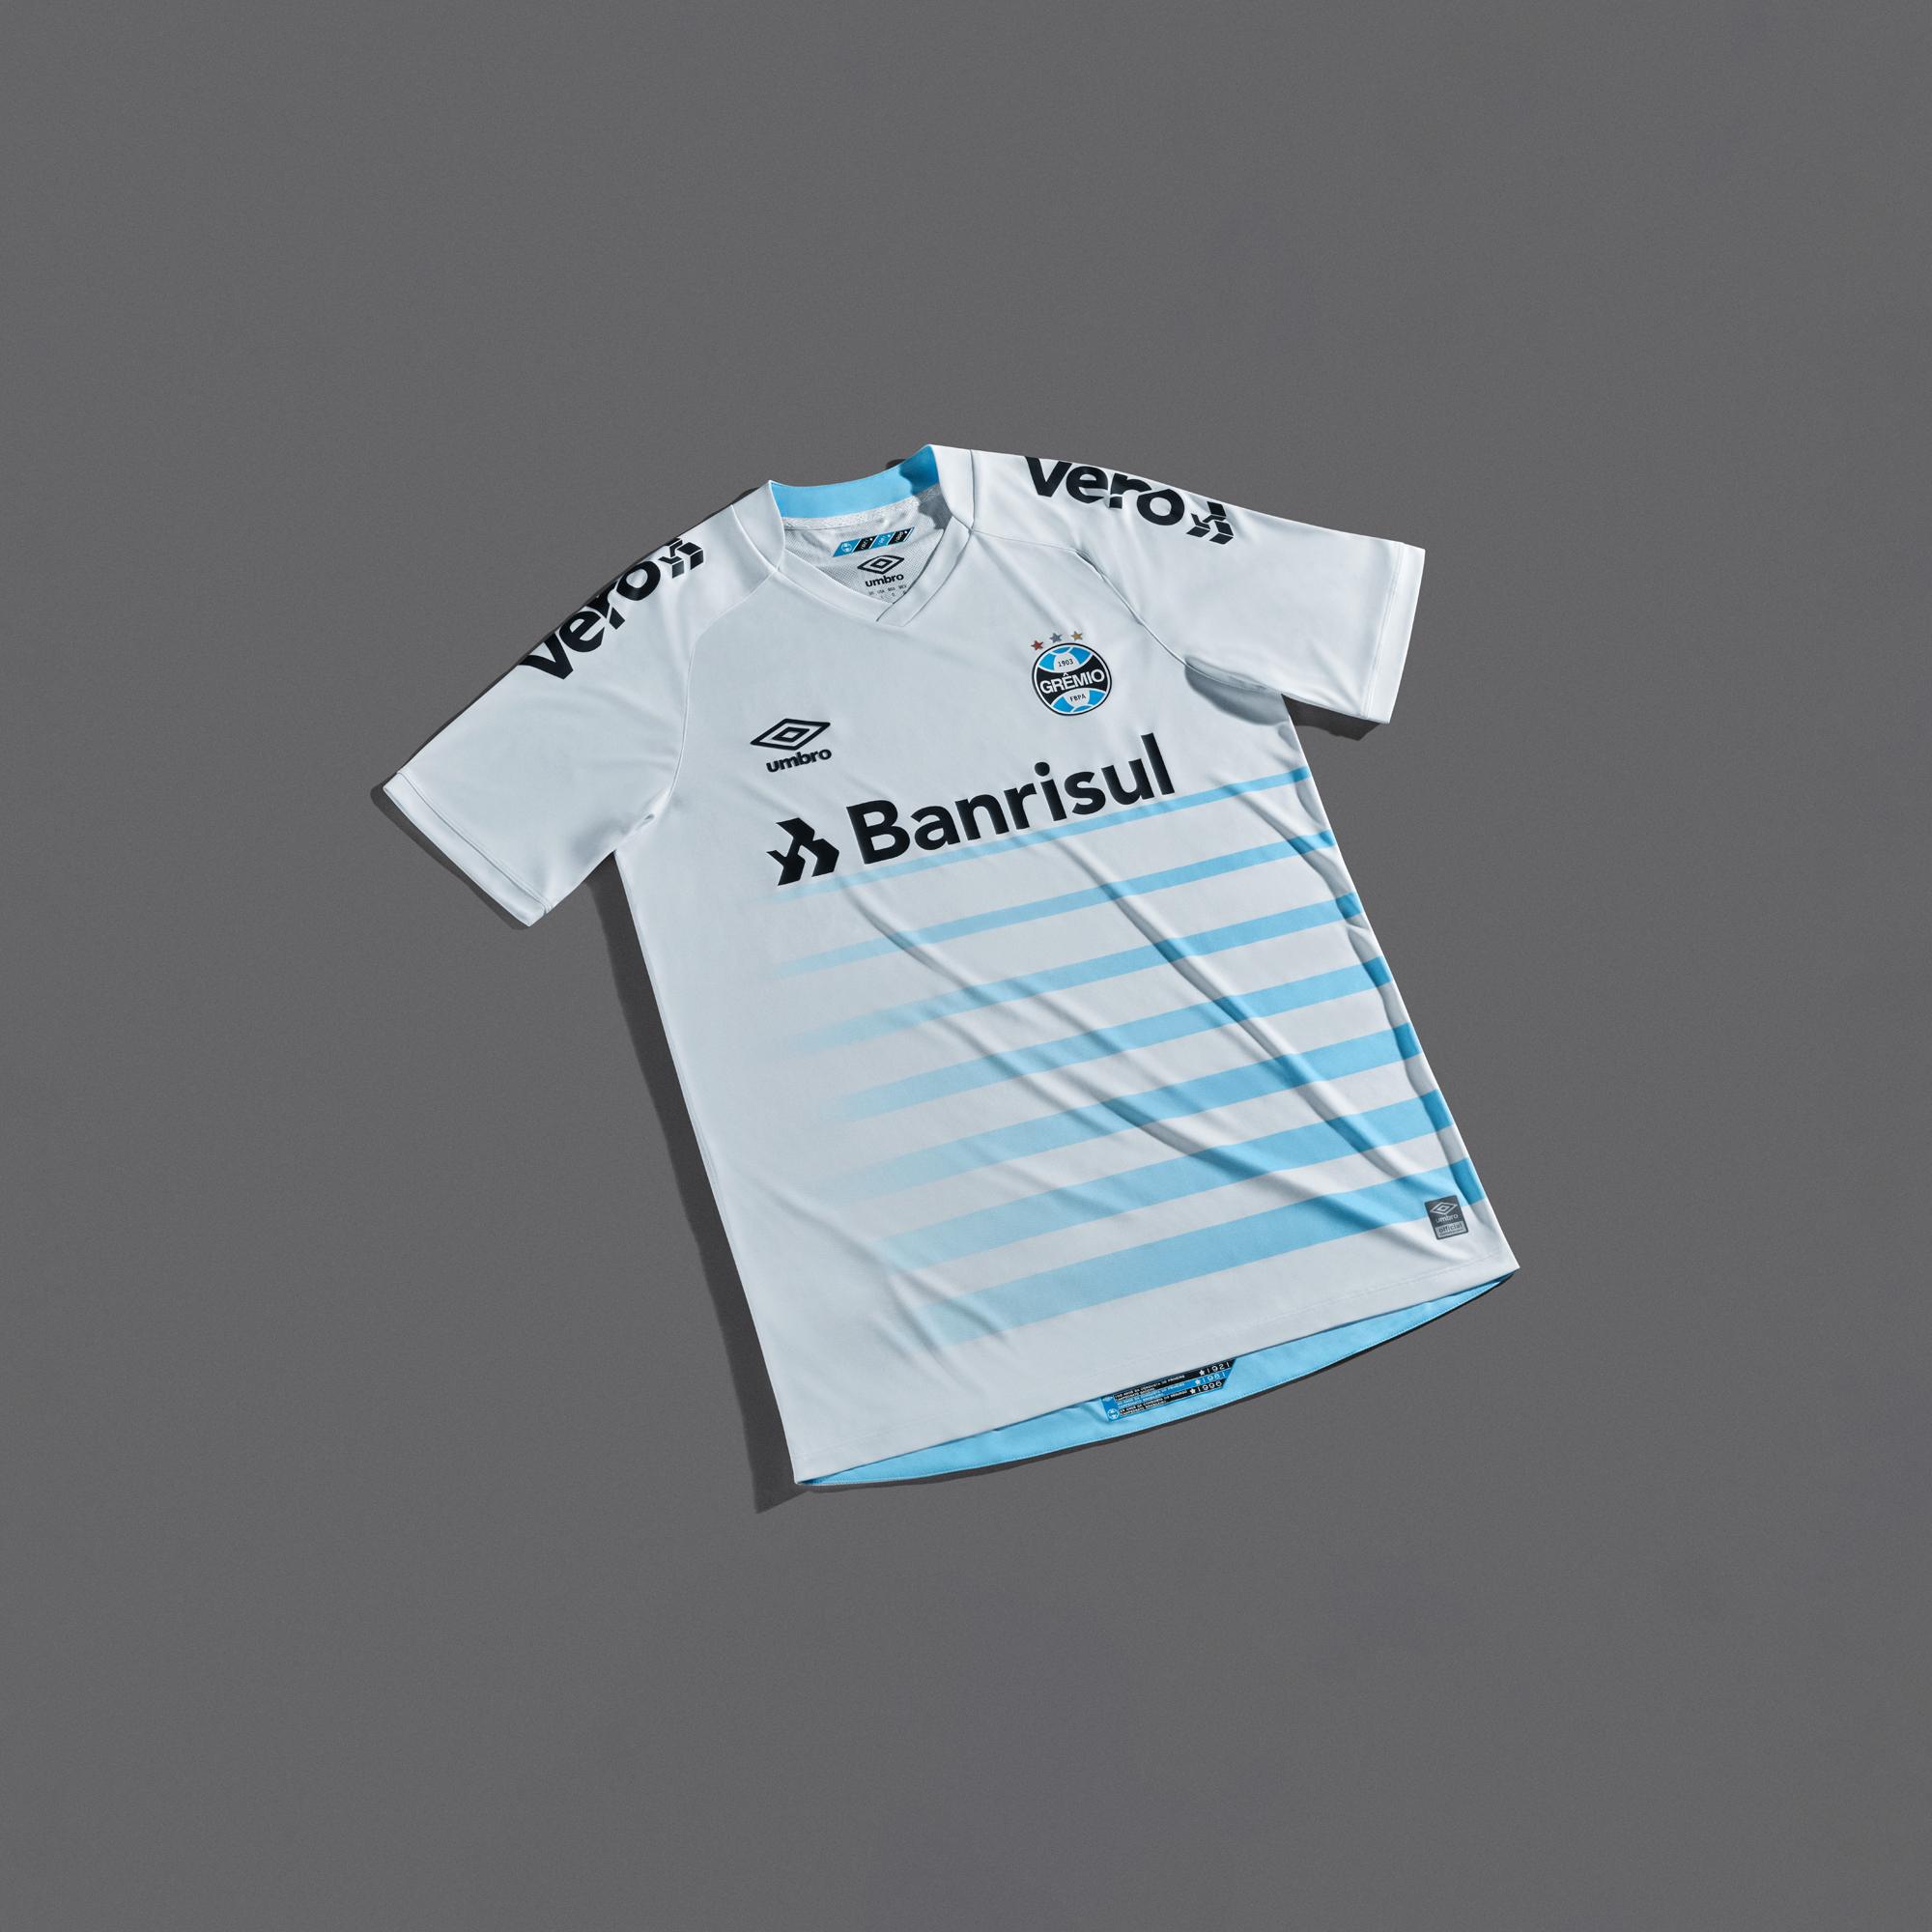 Grêmio 21/22 Home & Away Kits